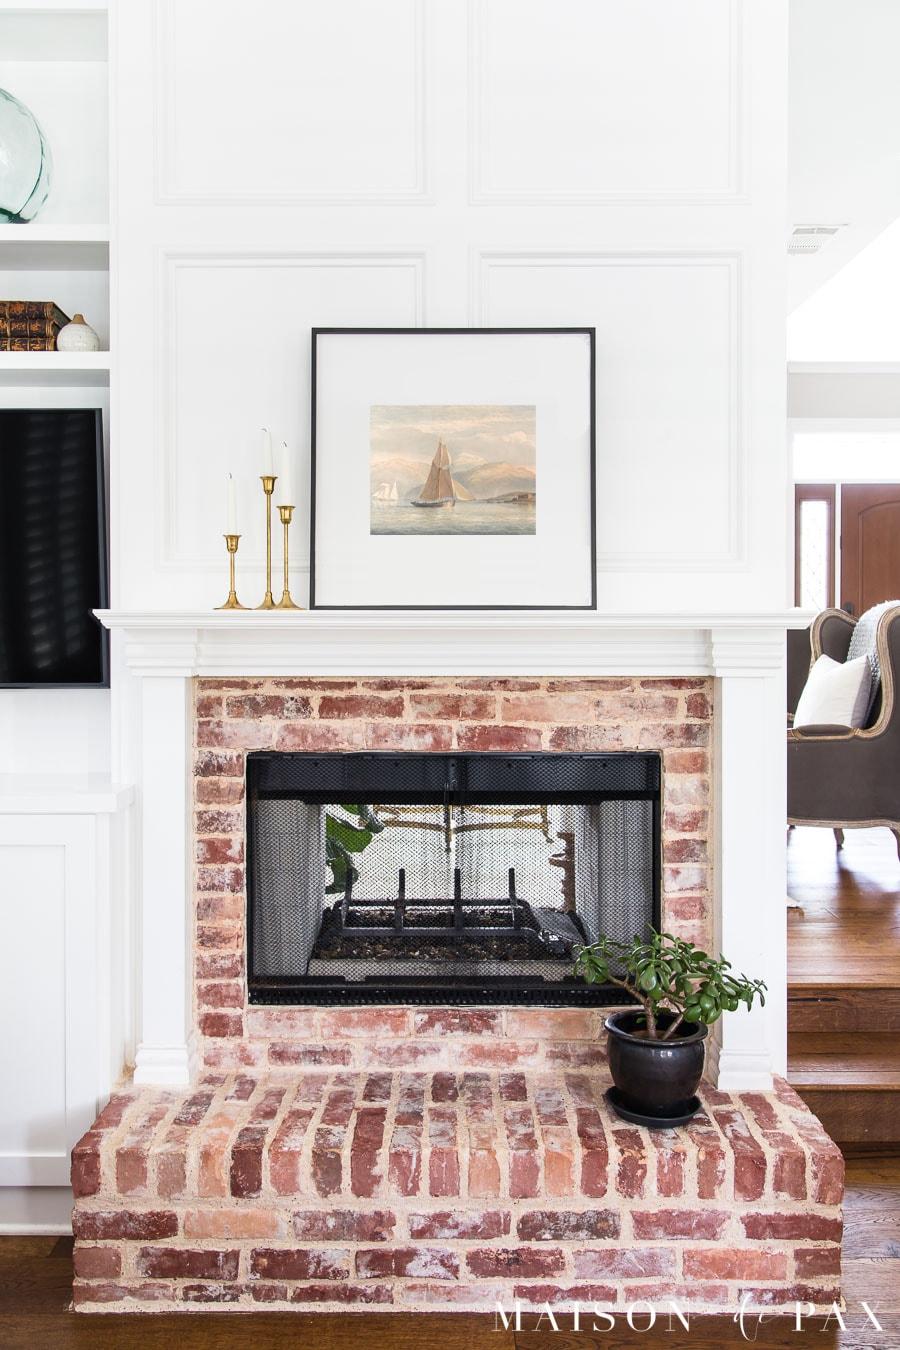 jade plant on fireplace hearth | Maison de Pax